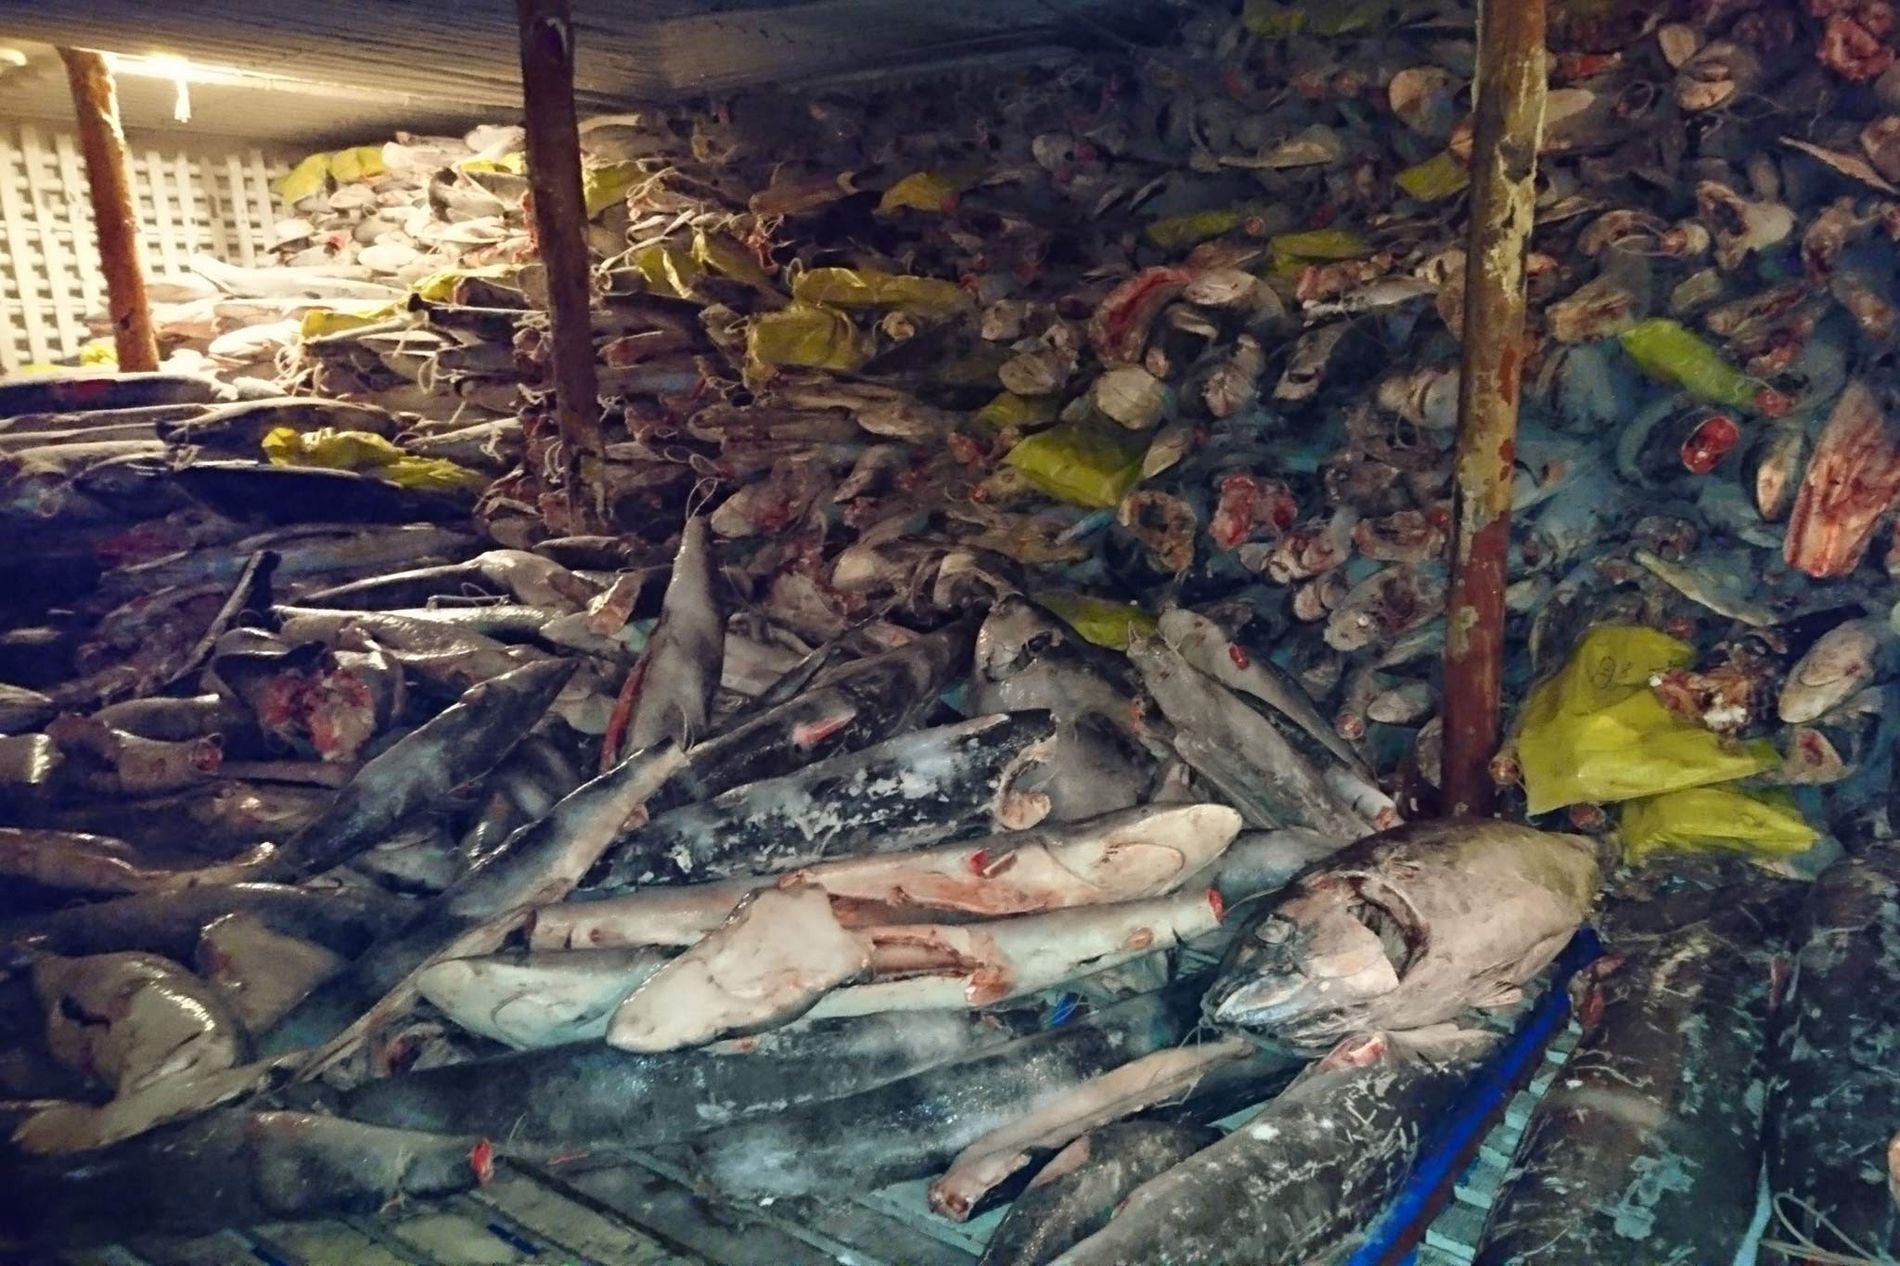 Tiburones pescados ilegalmente